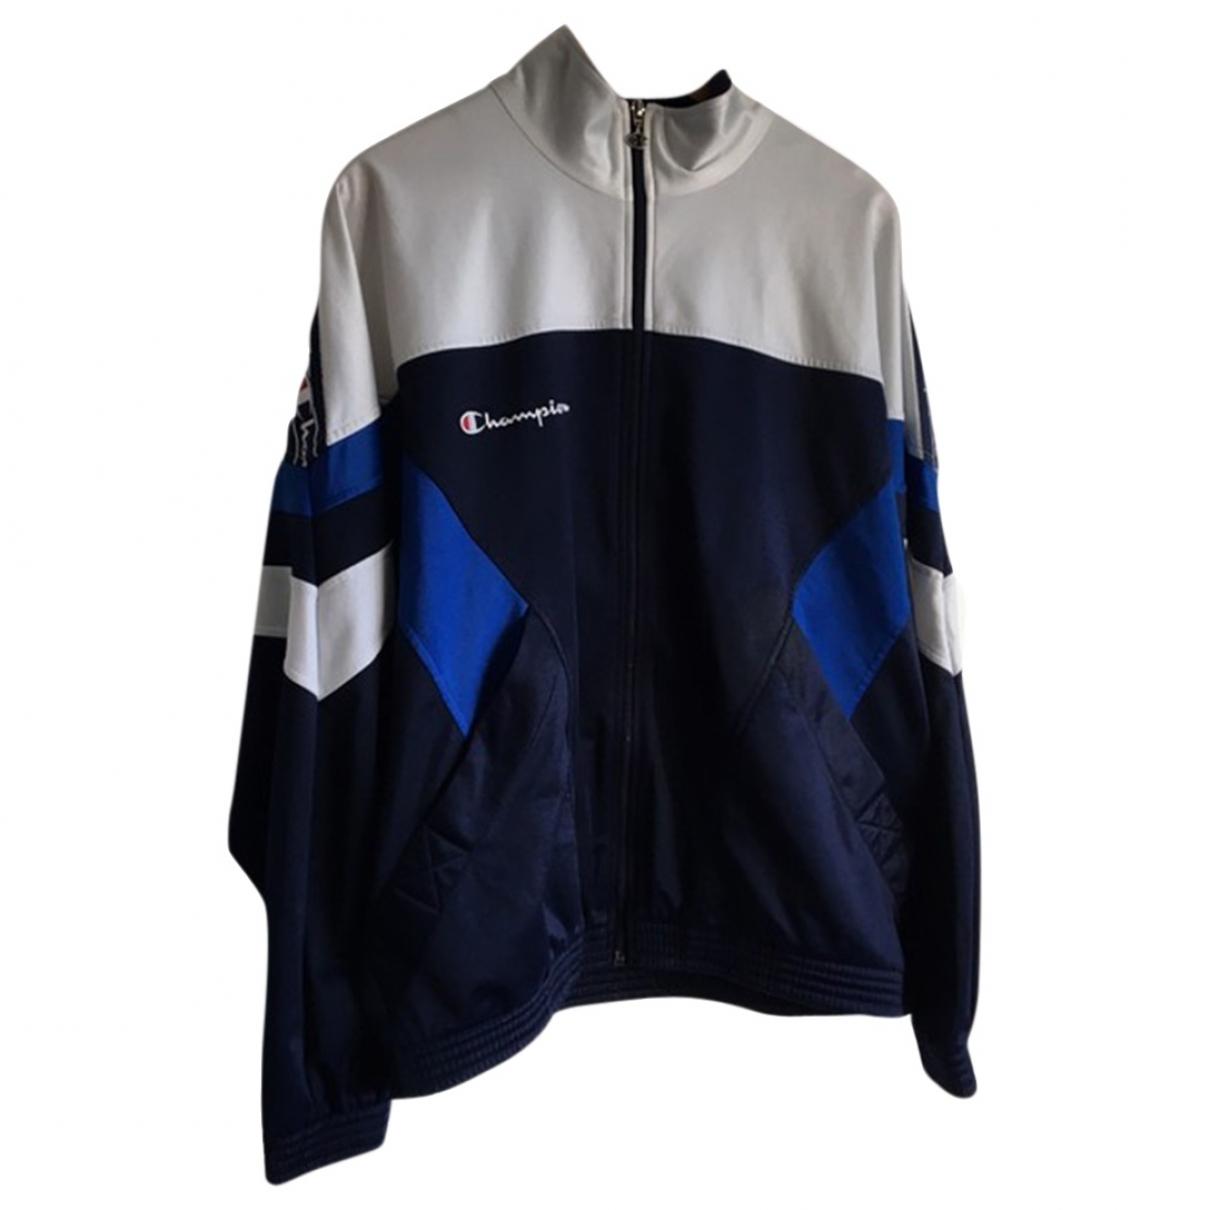 Champion \N Blue jacket  for Men M International